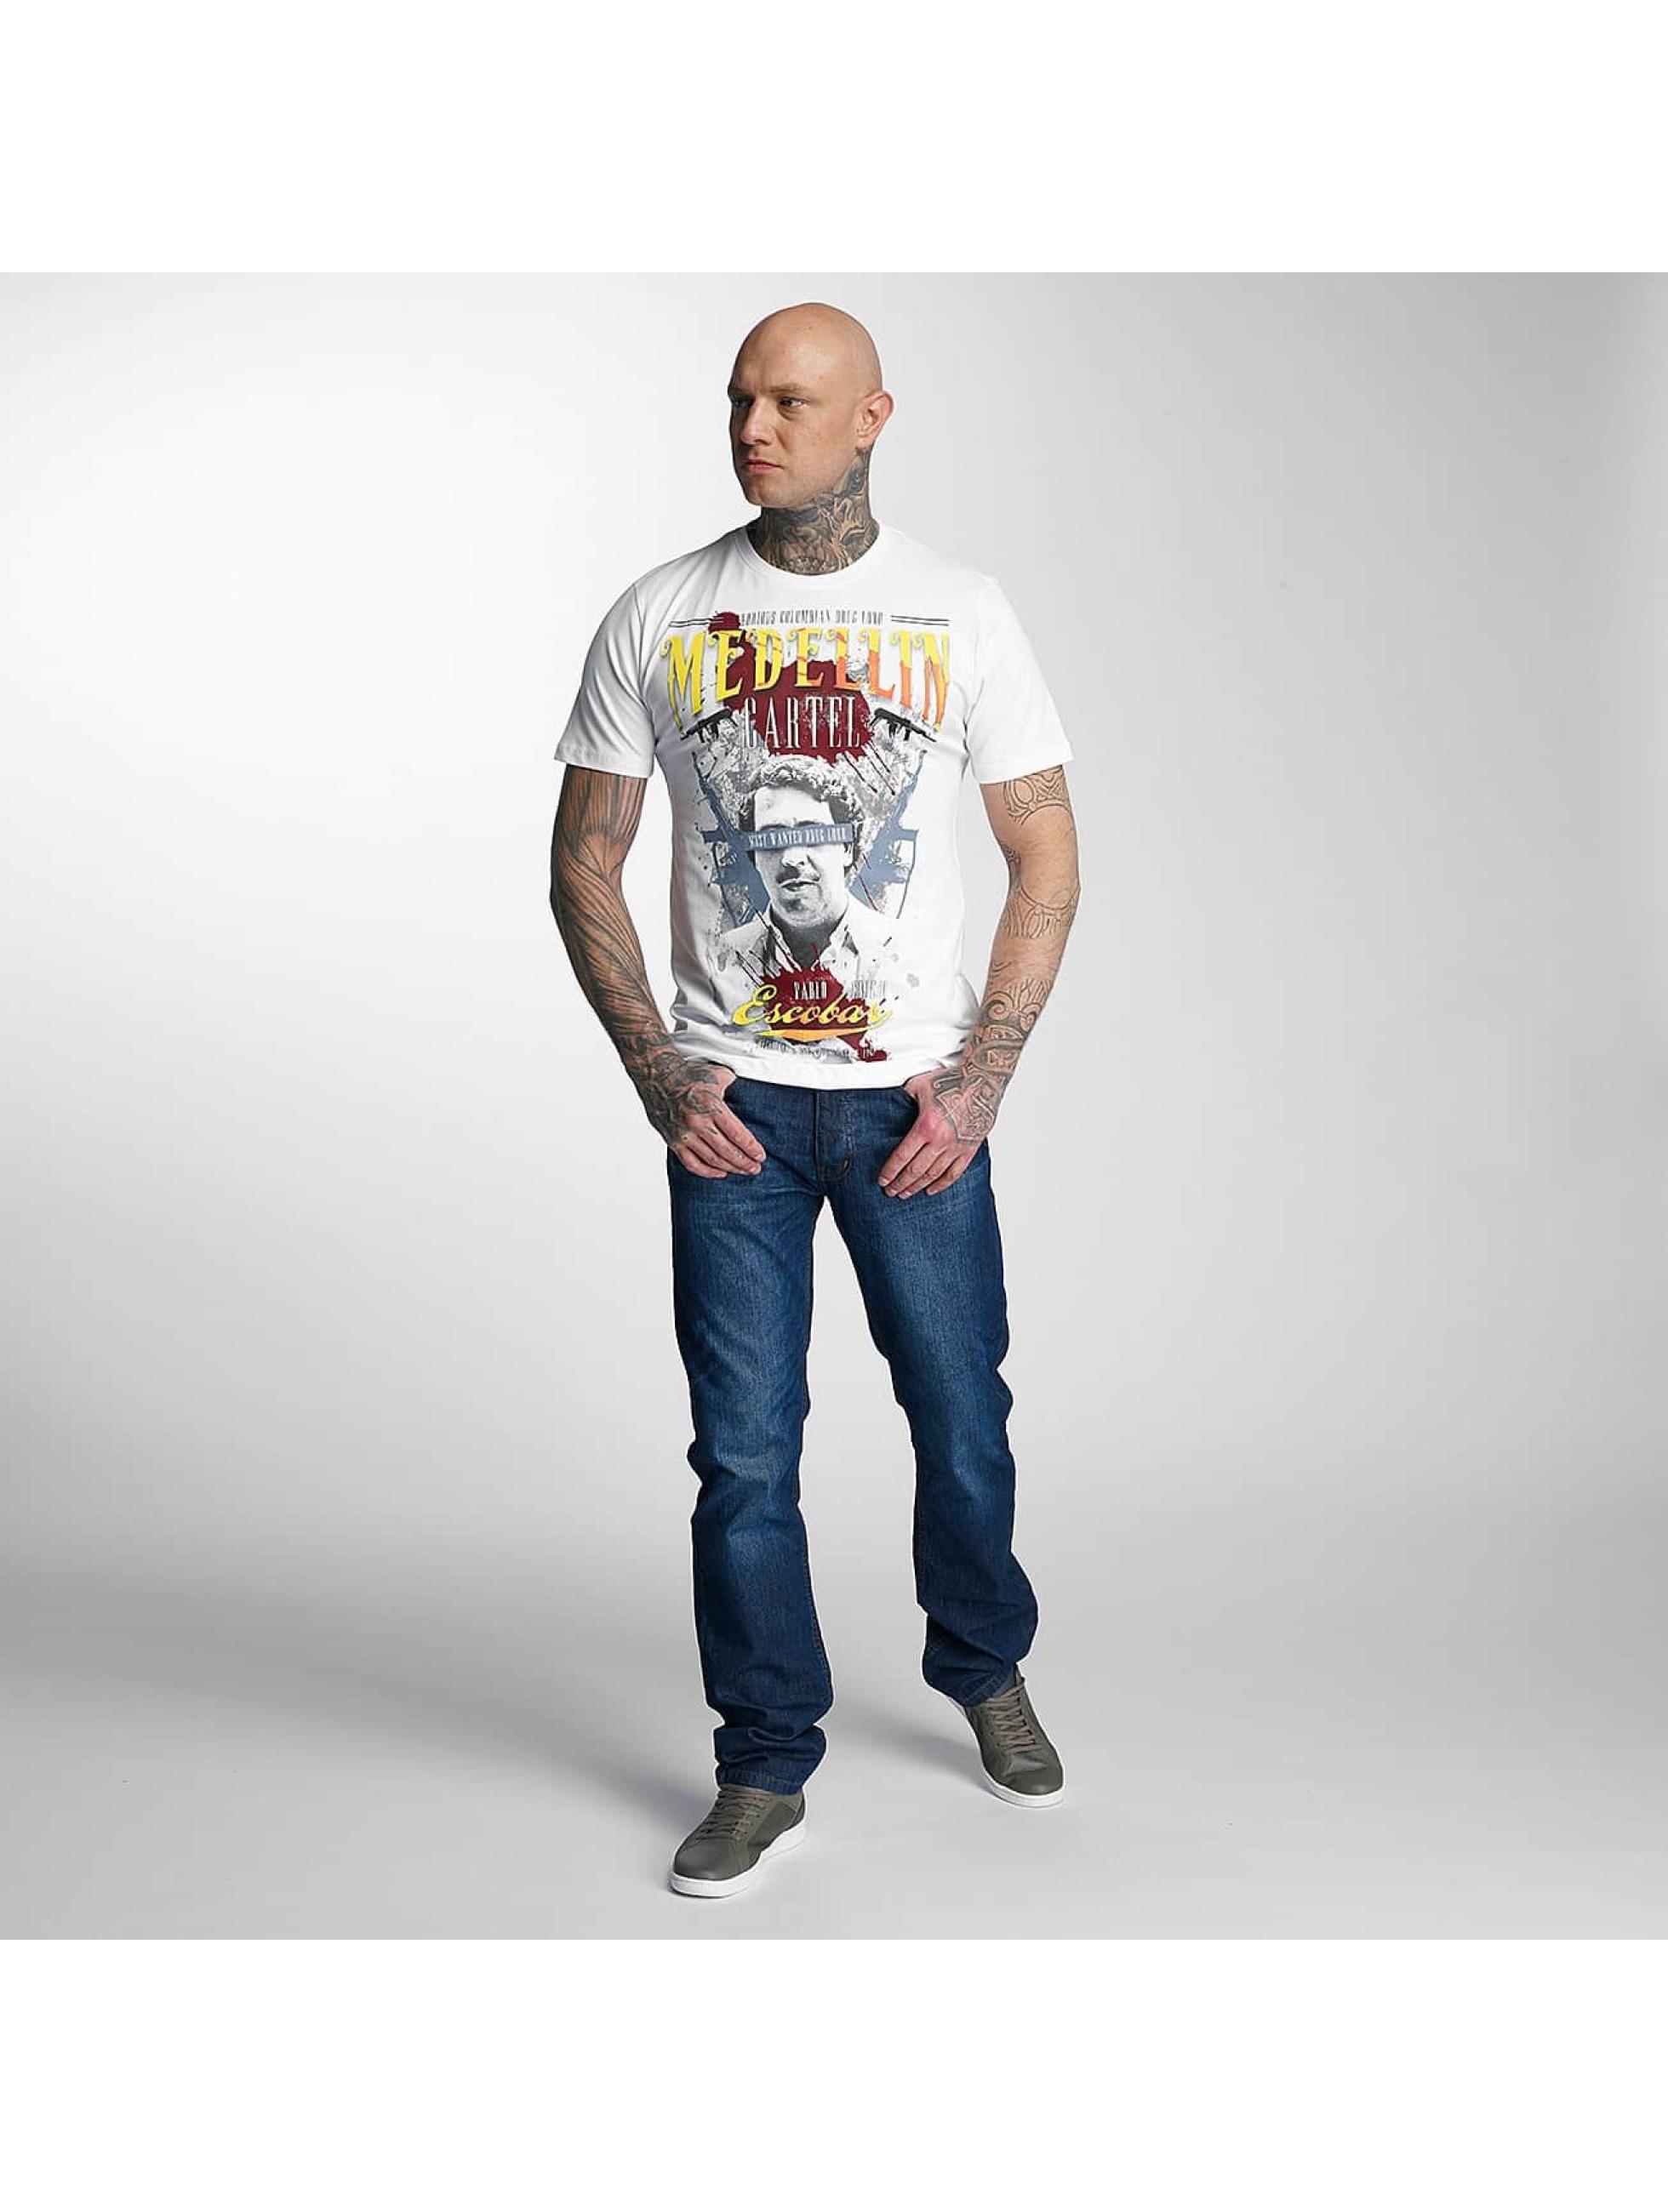 Mafia & Crime T-Shirt Medellin Escobar weiß